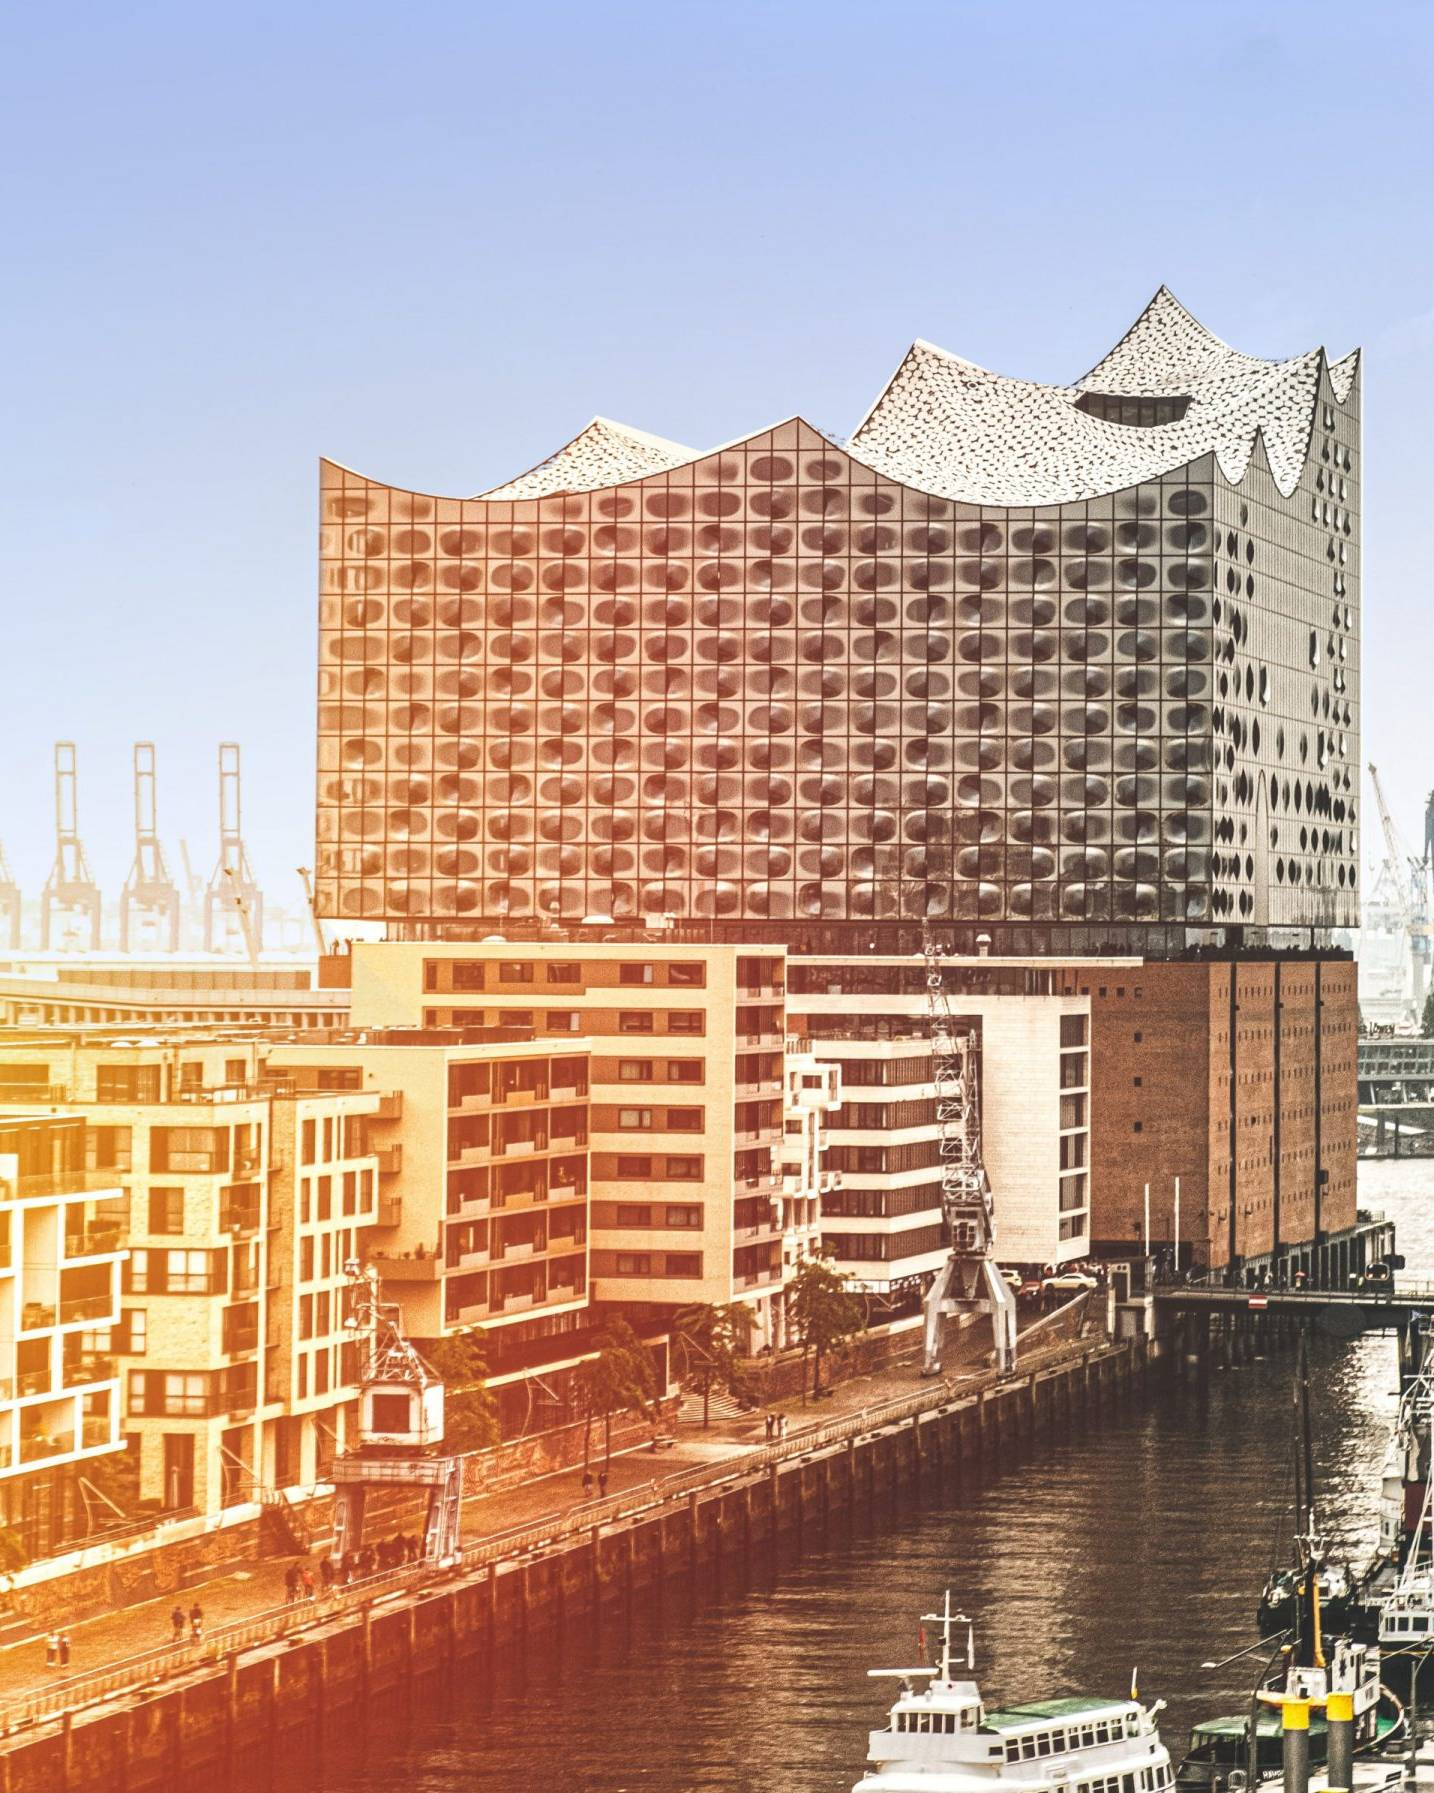 Hamburg Elbphilharmonie Hotel Stadtpark Buxtehude Sonne scaled uai